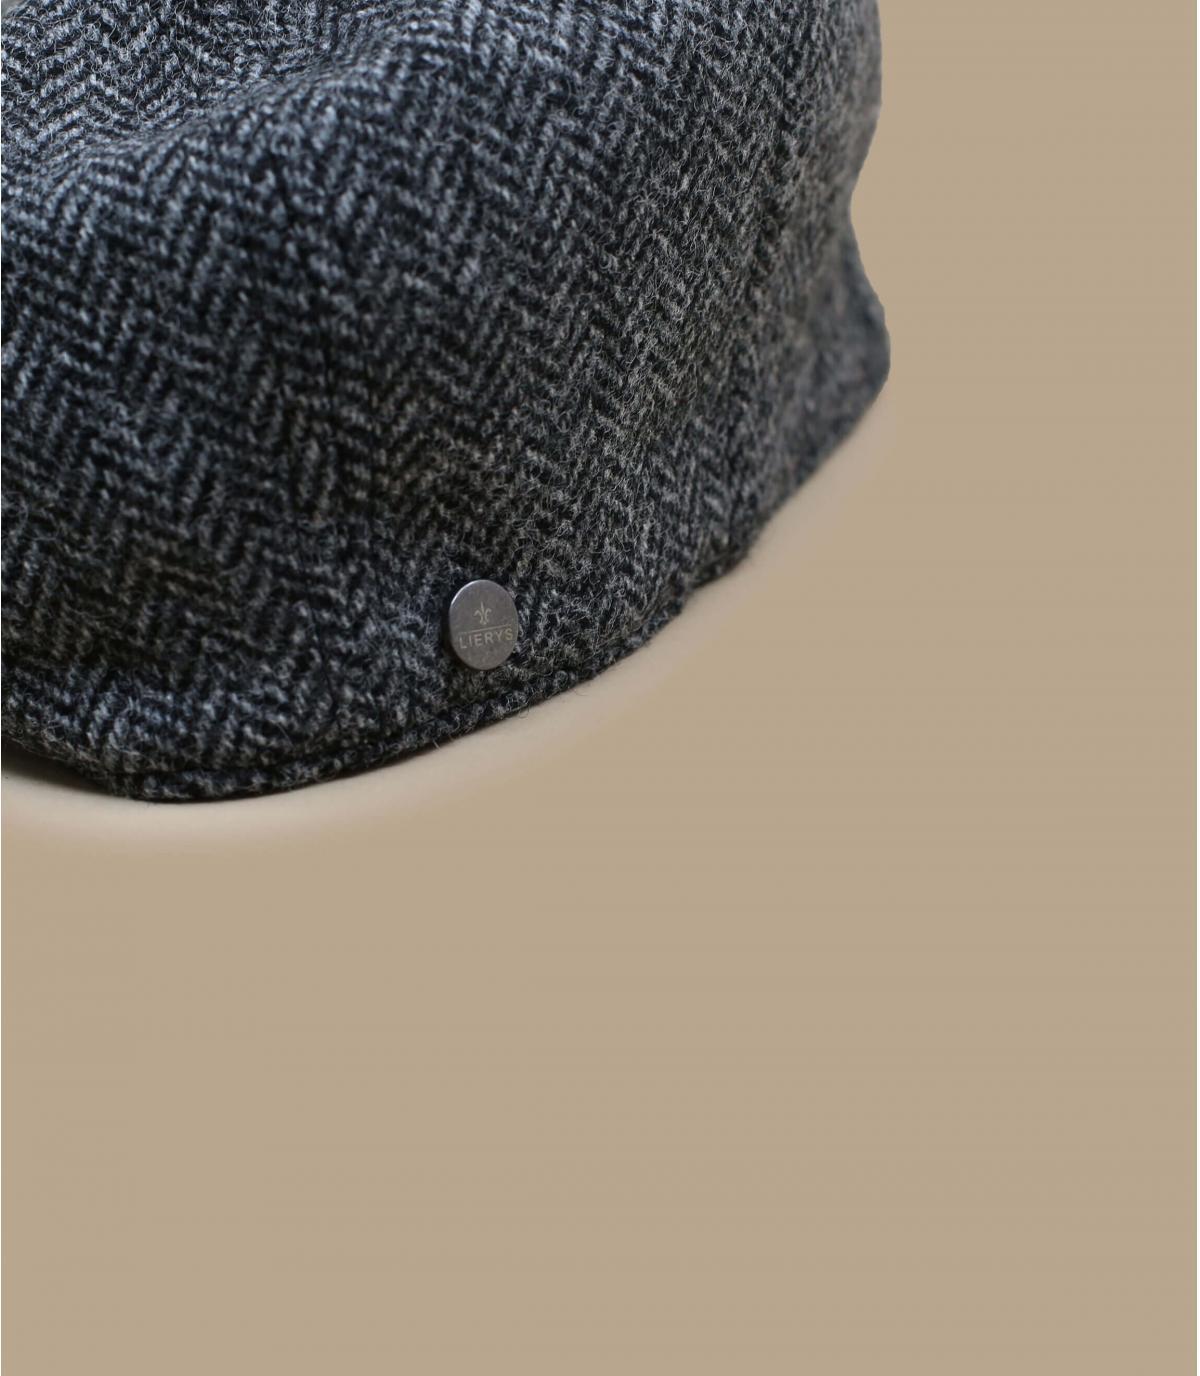 Detalles Britton Wool Herringbone grey imagen 2